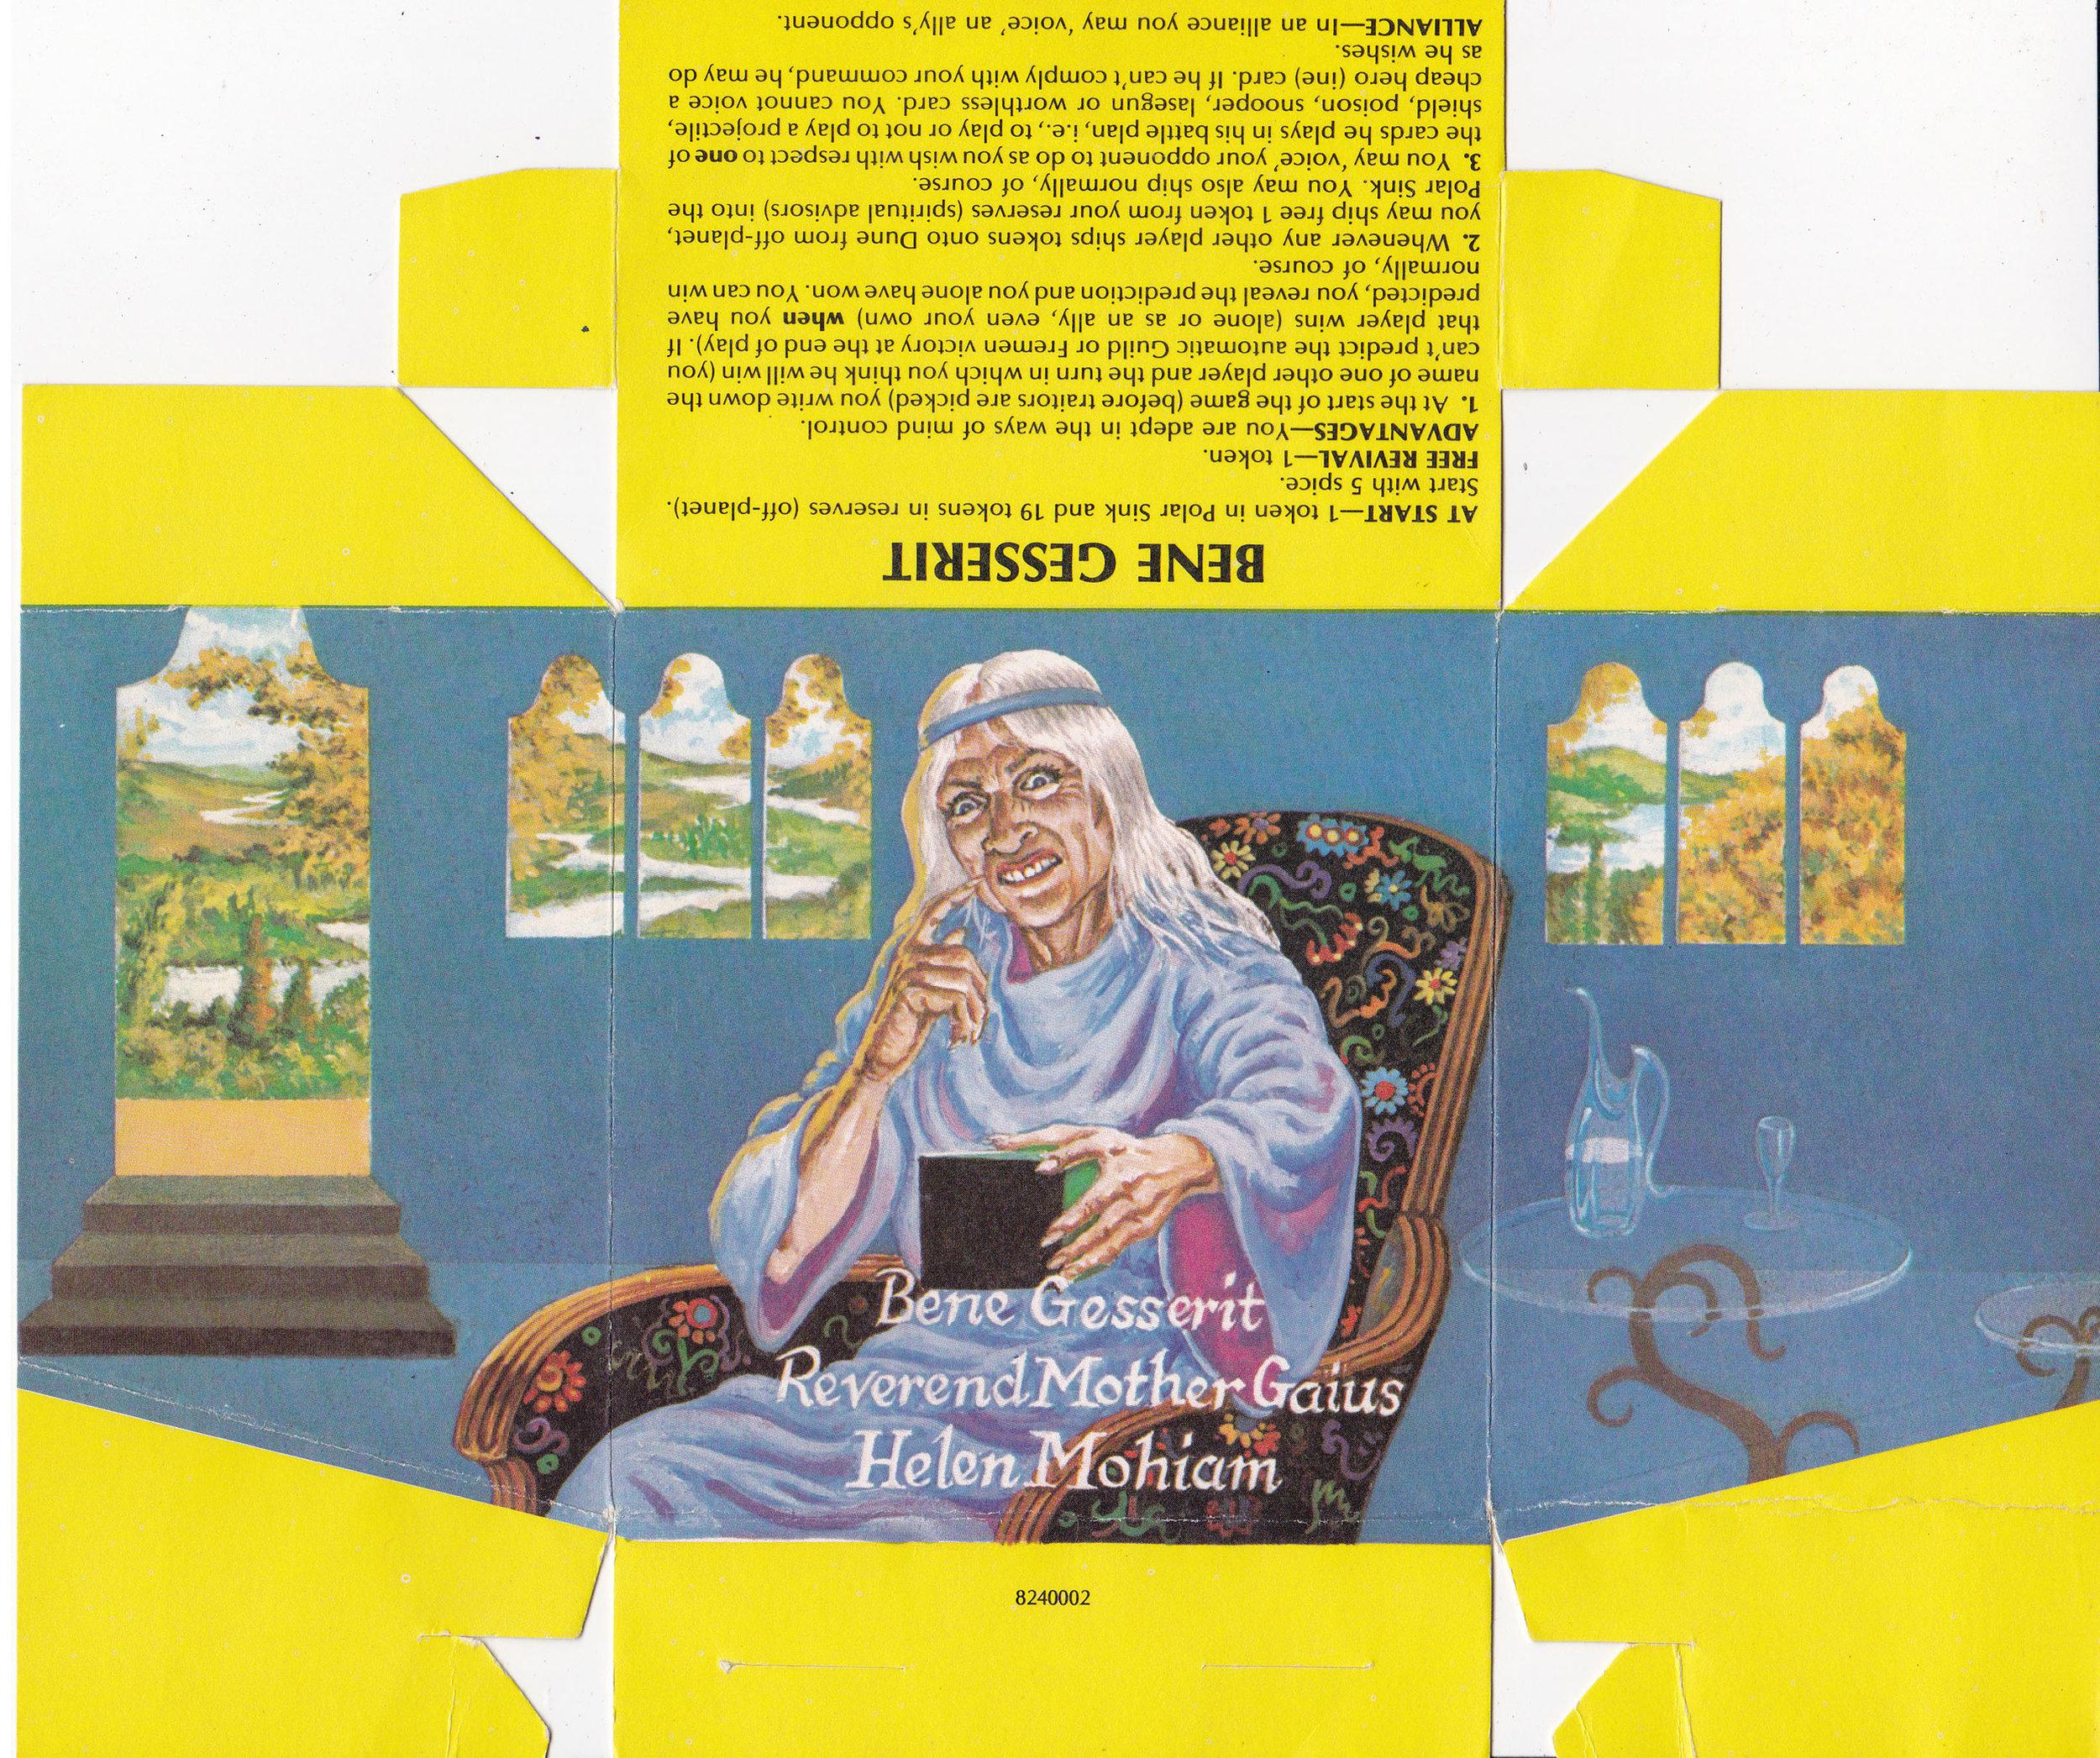 Bene Gesserit: Reverend Mother Gaius Helen Mohiam